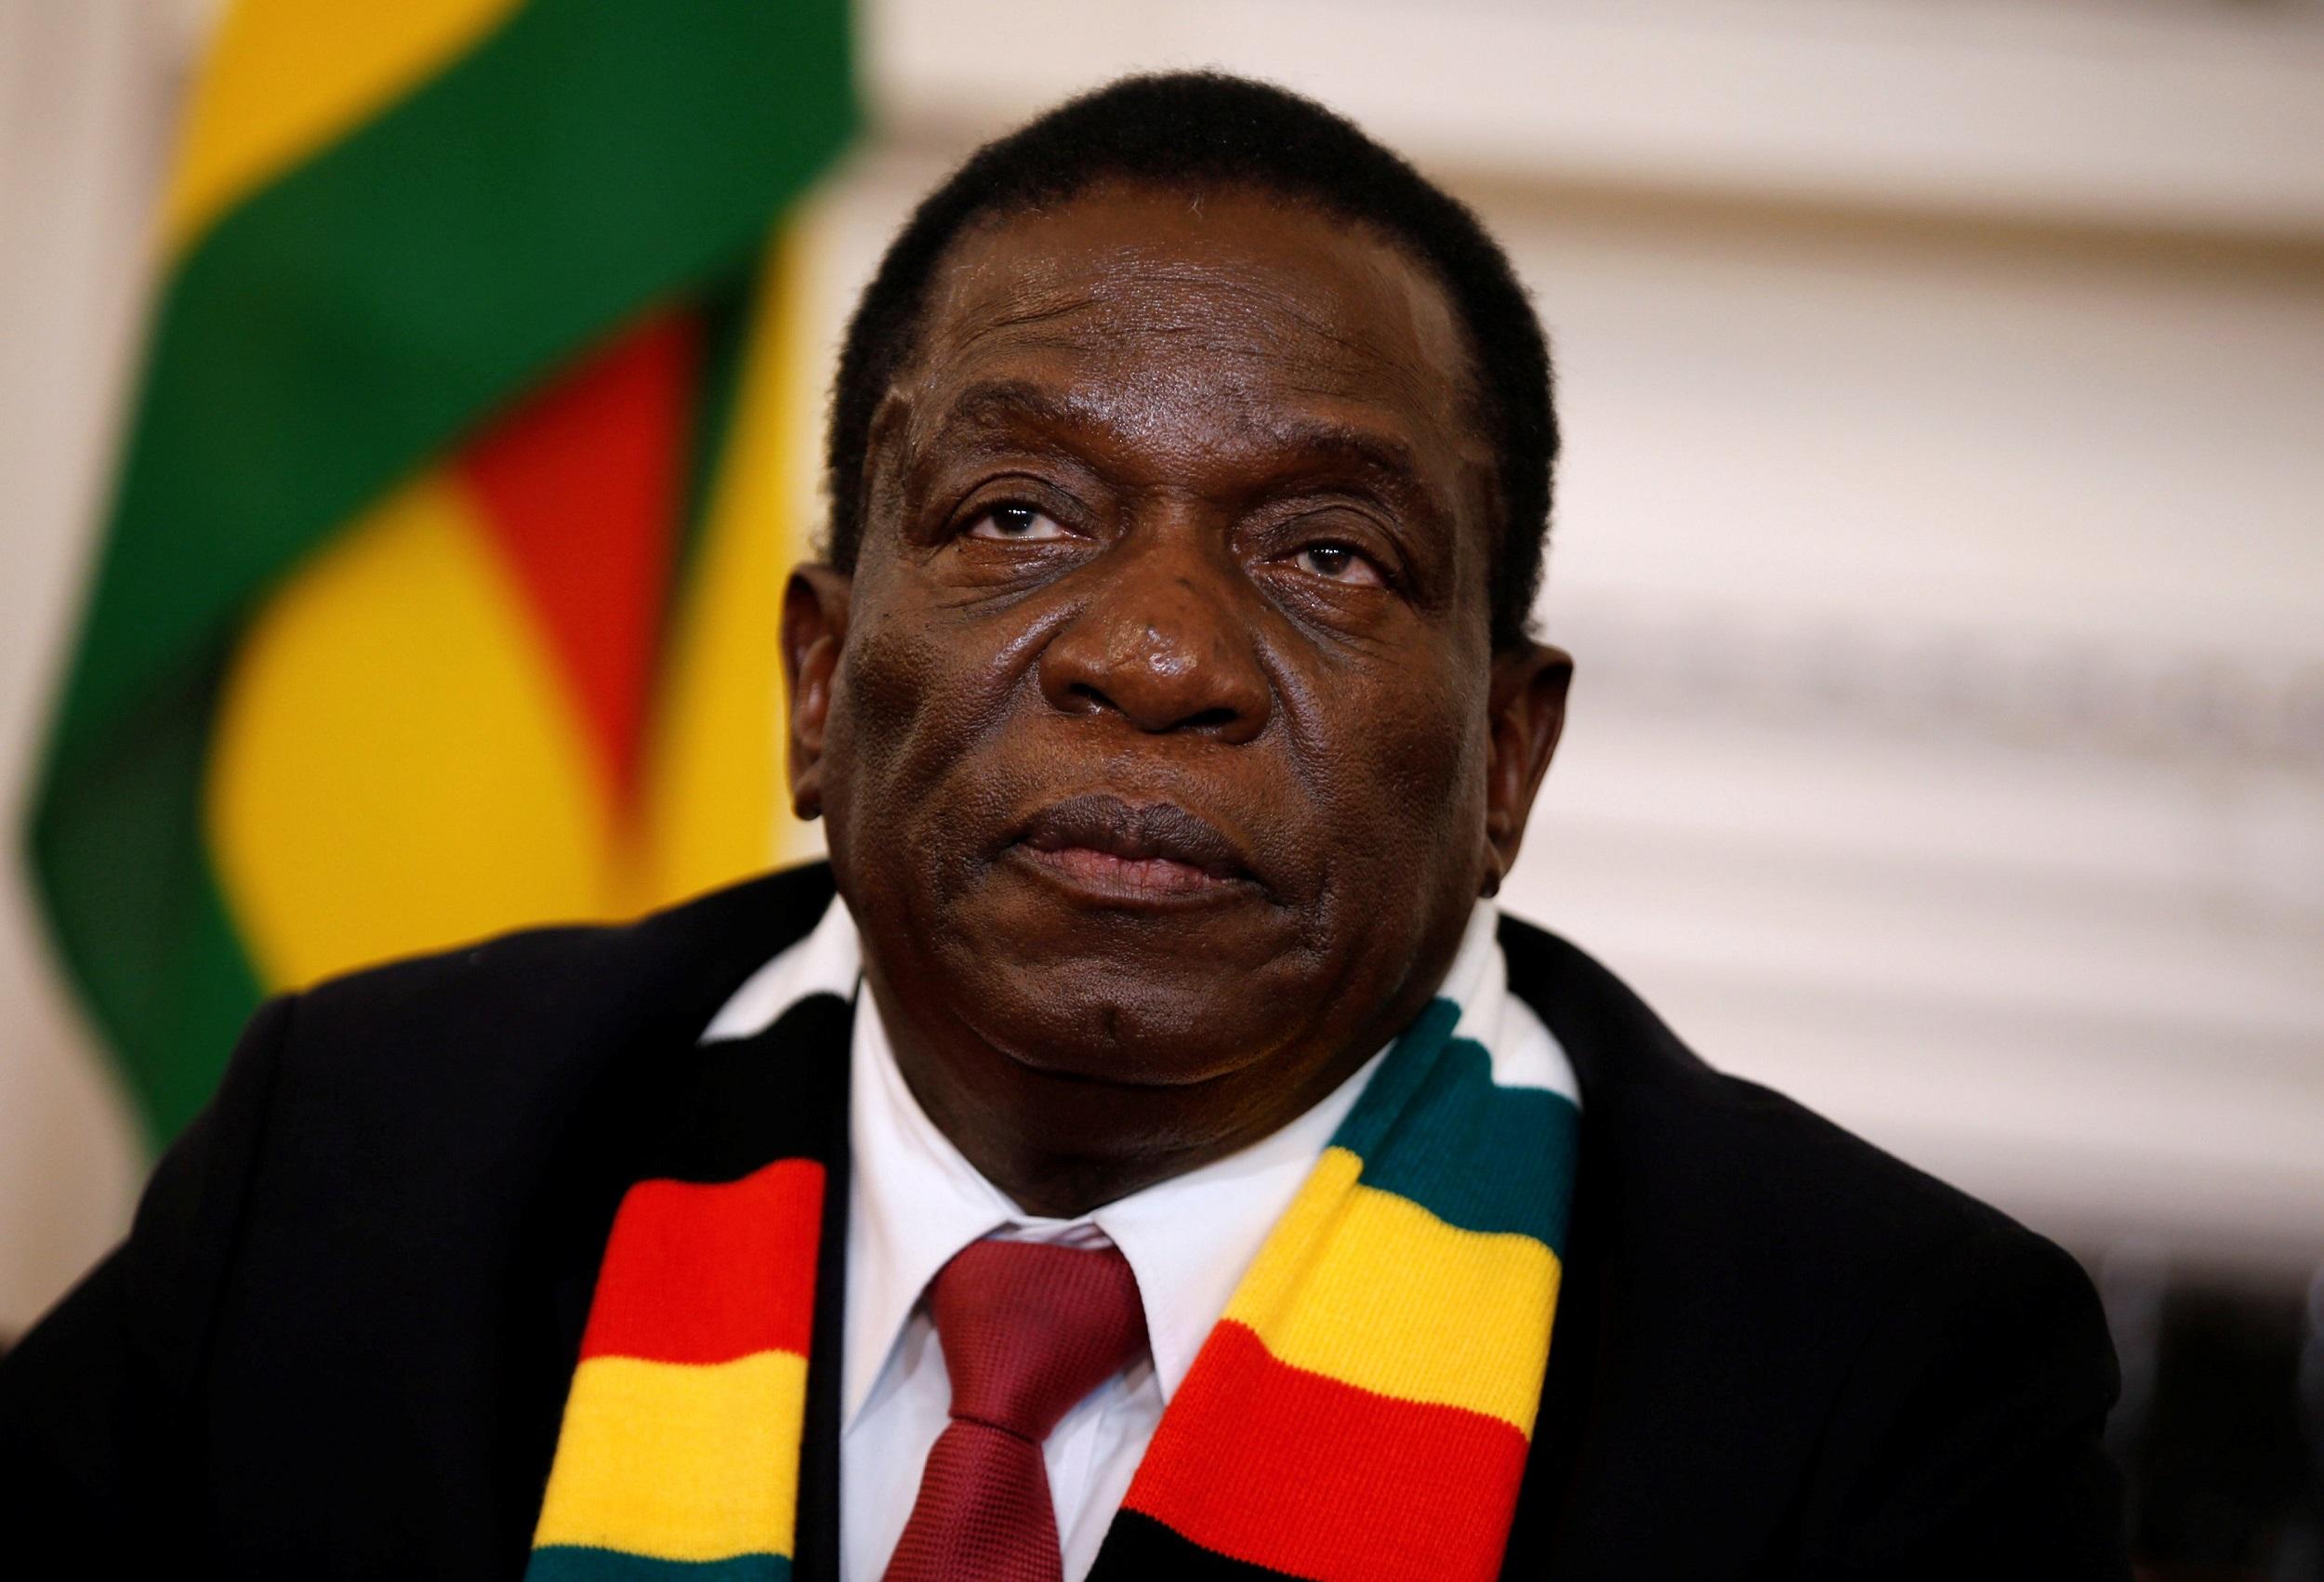 President Emmerson Mnangagwa Said Zimbabweans Should Now Unite To Rebuild The Economy